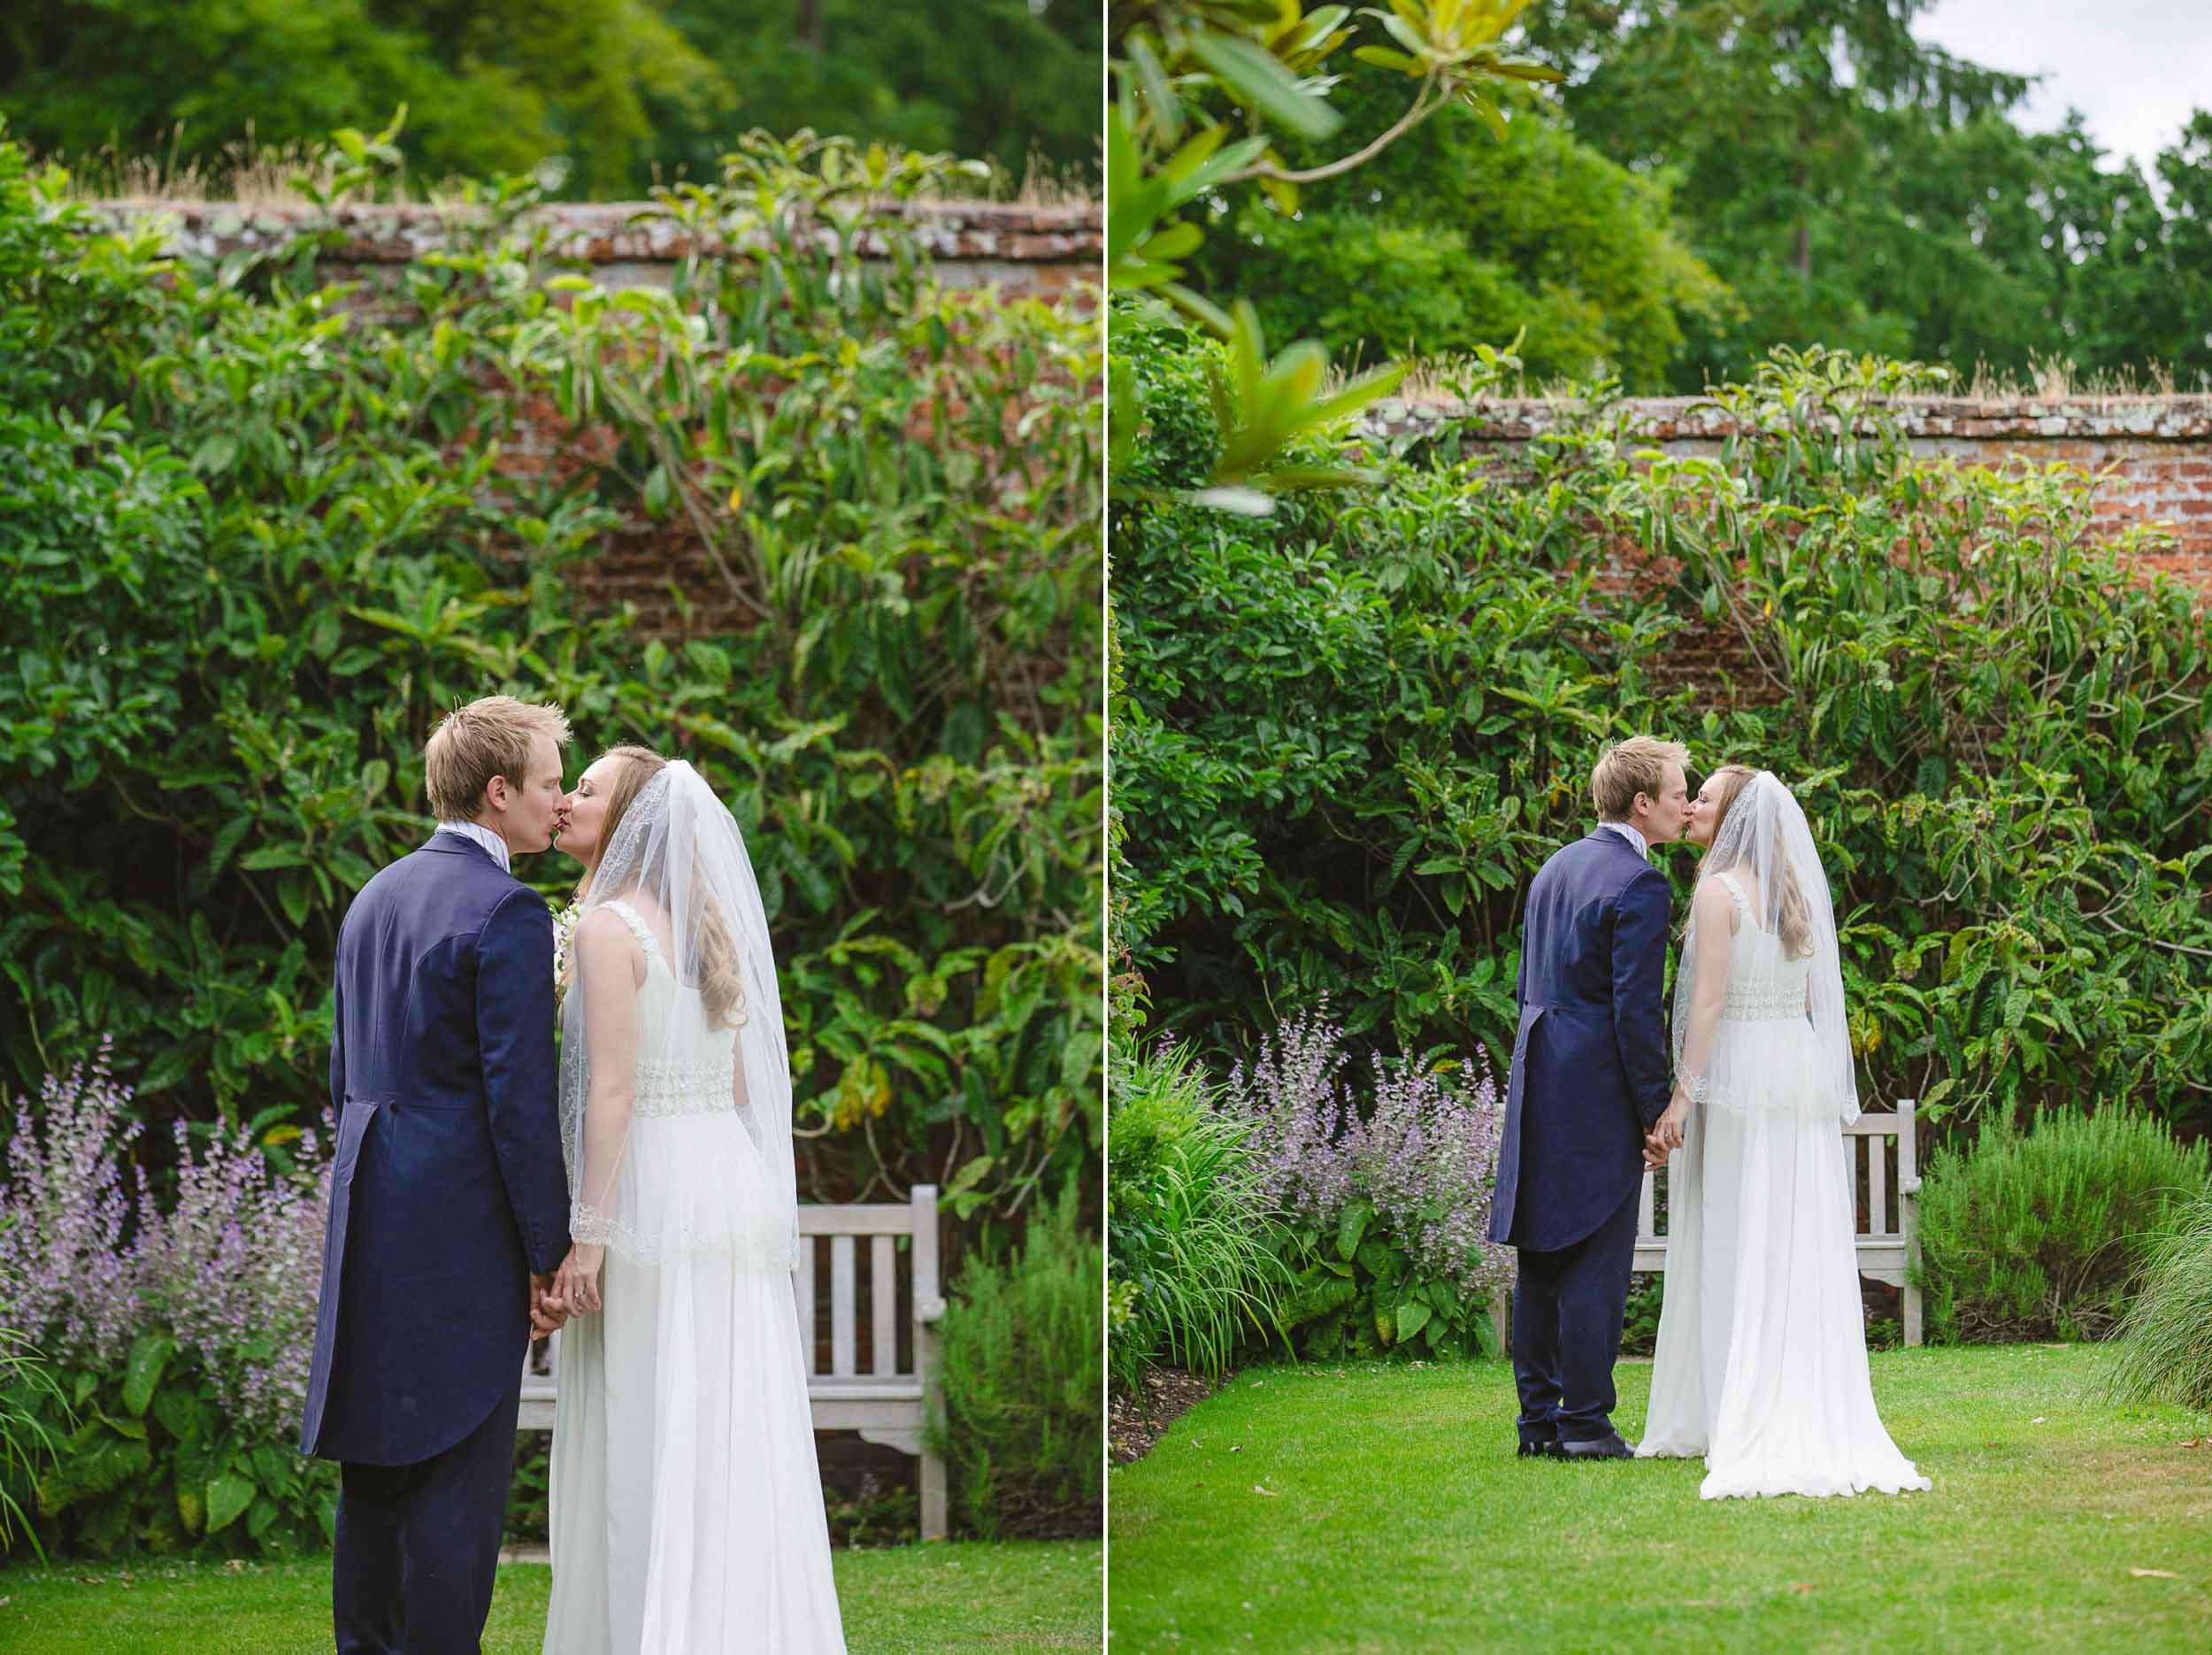 Marks-Hall-Wedding-Photographer-45.jpg